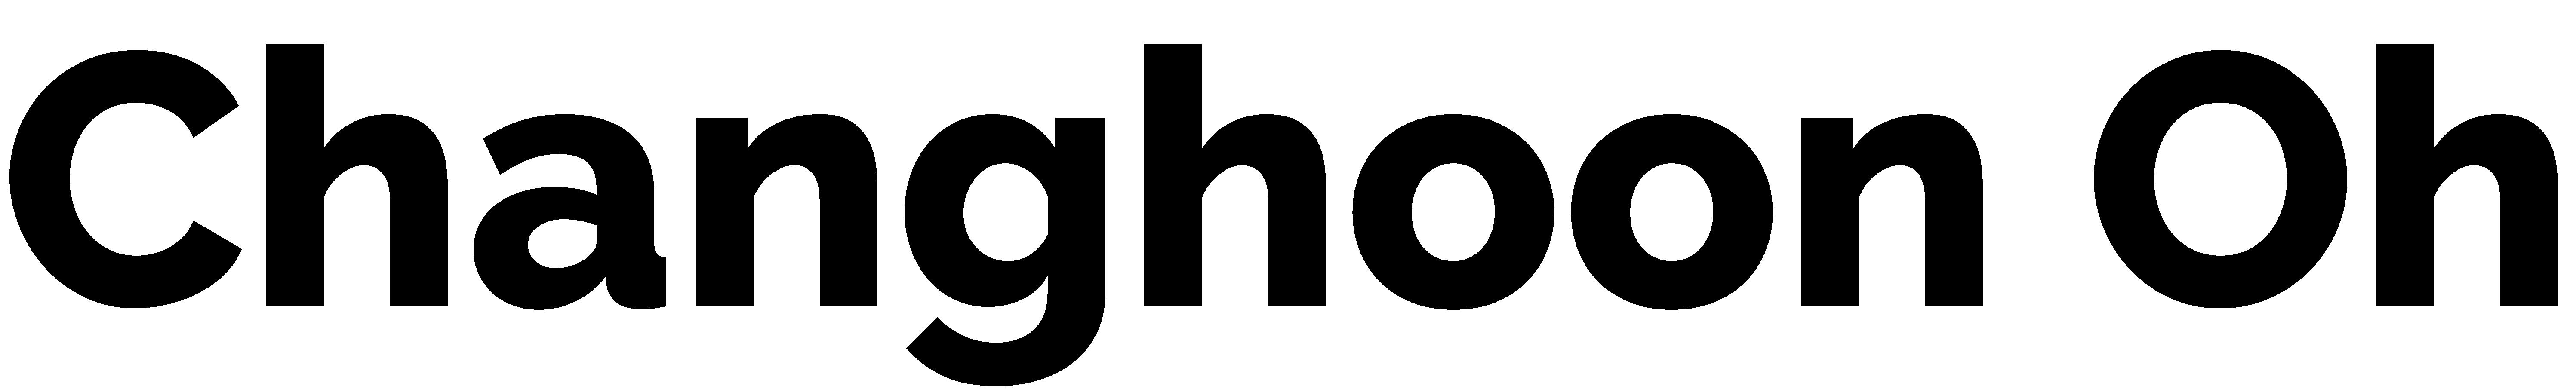 Changhoon Oh Logo